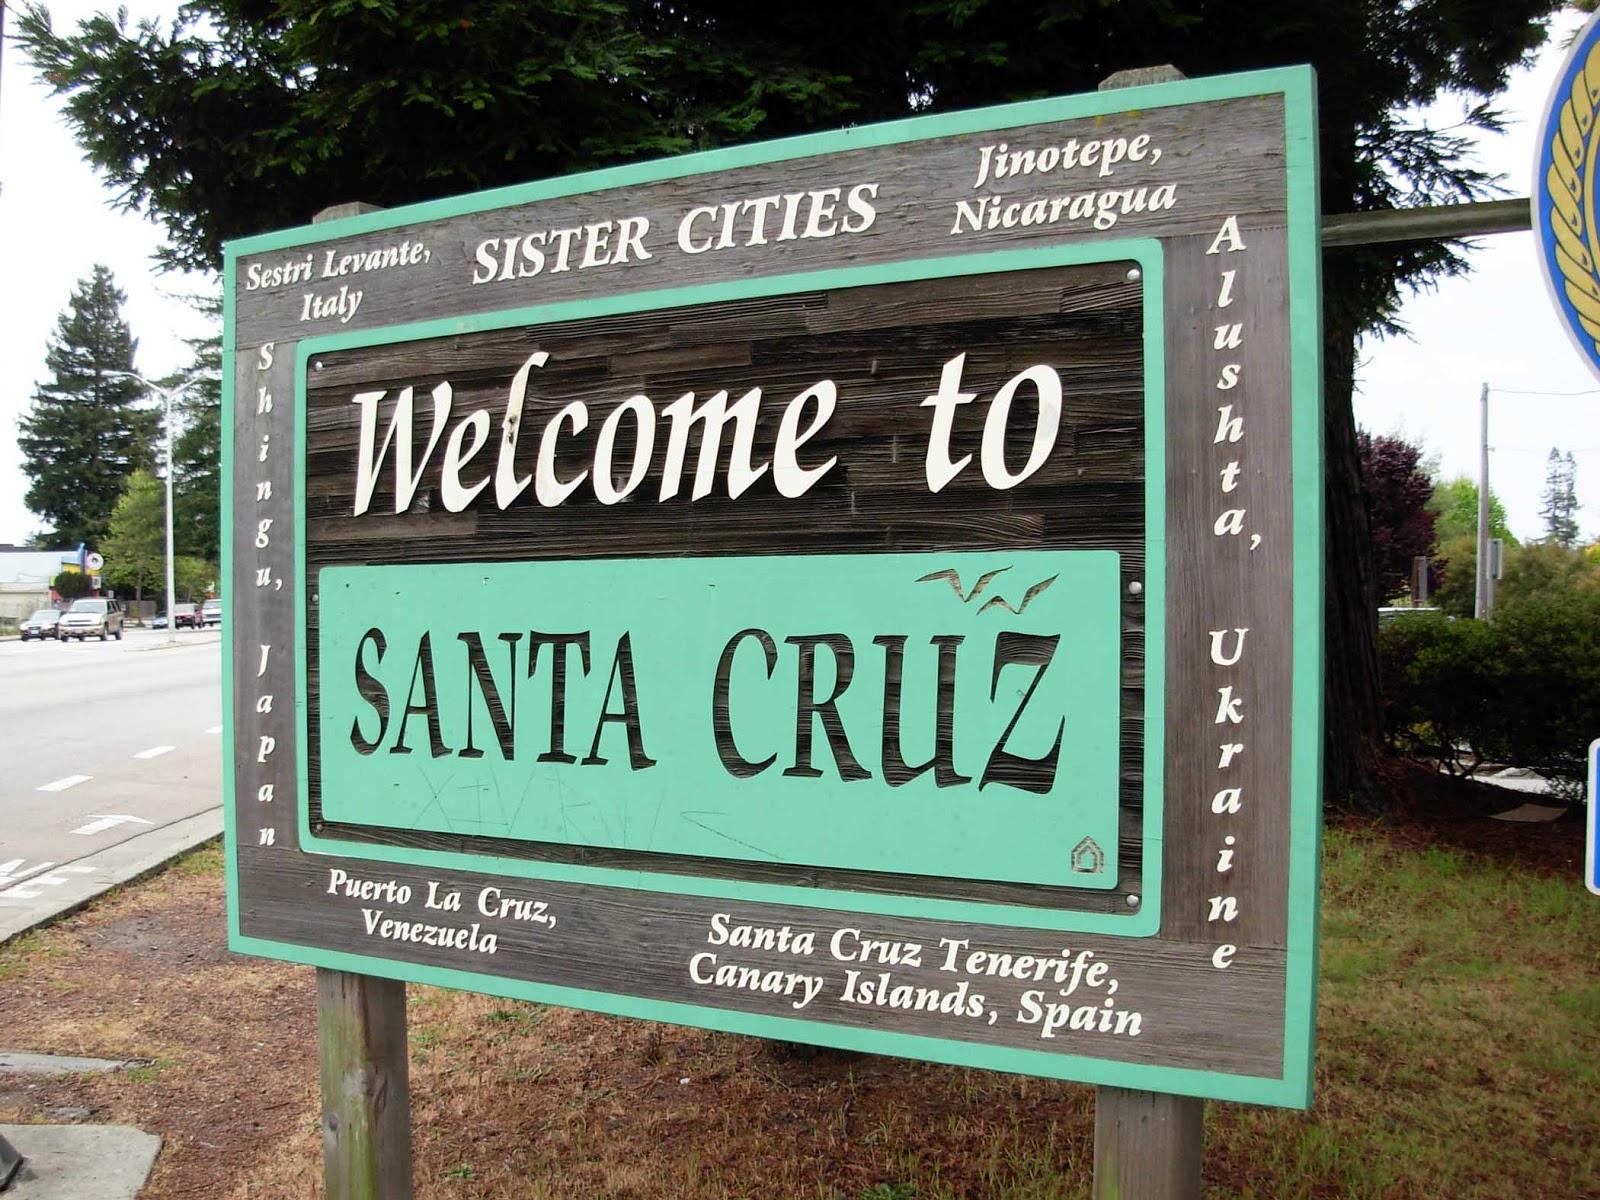 Welcome to Santa Cruz sign